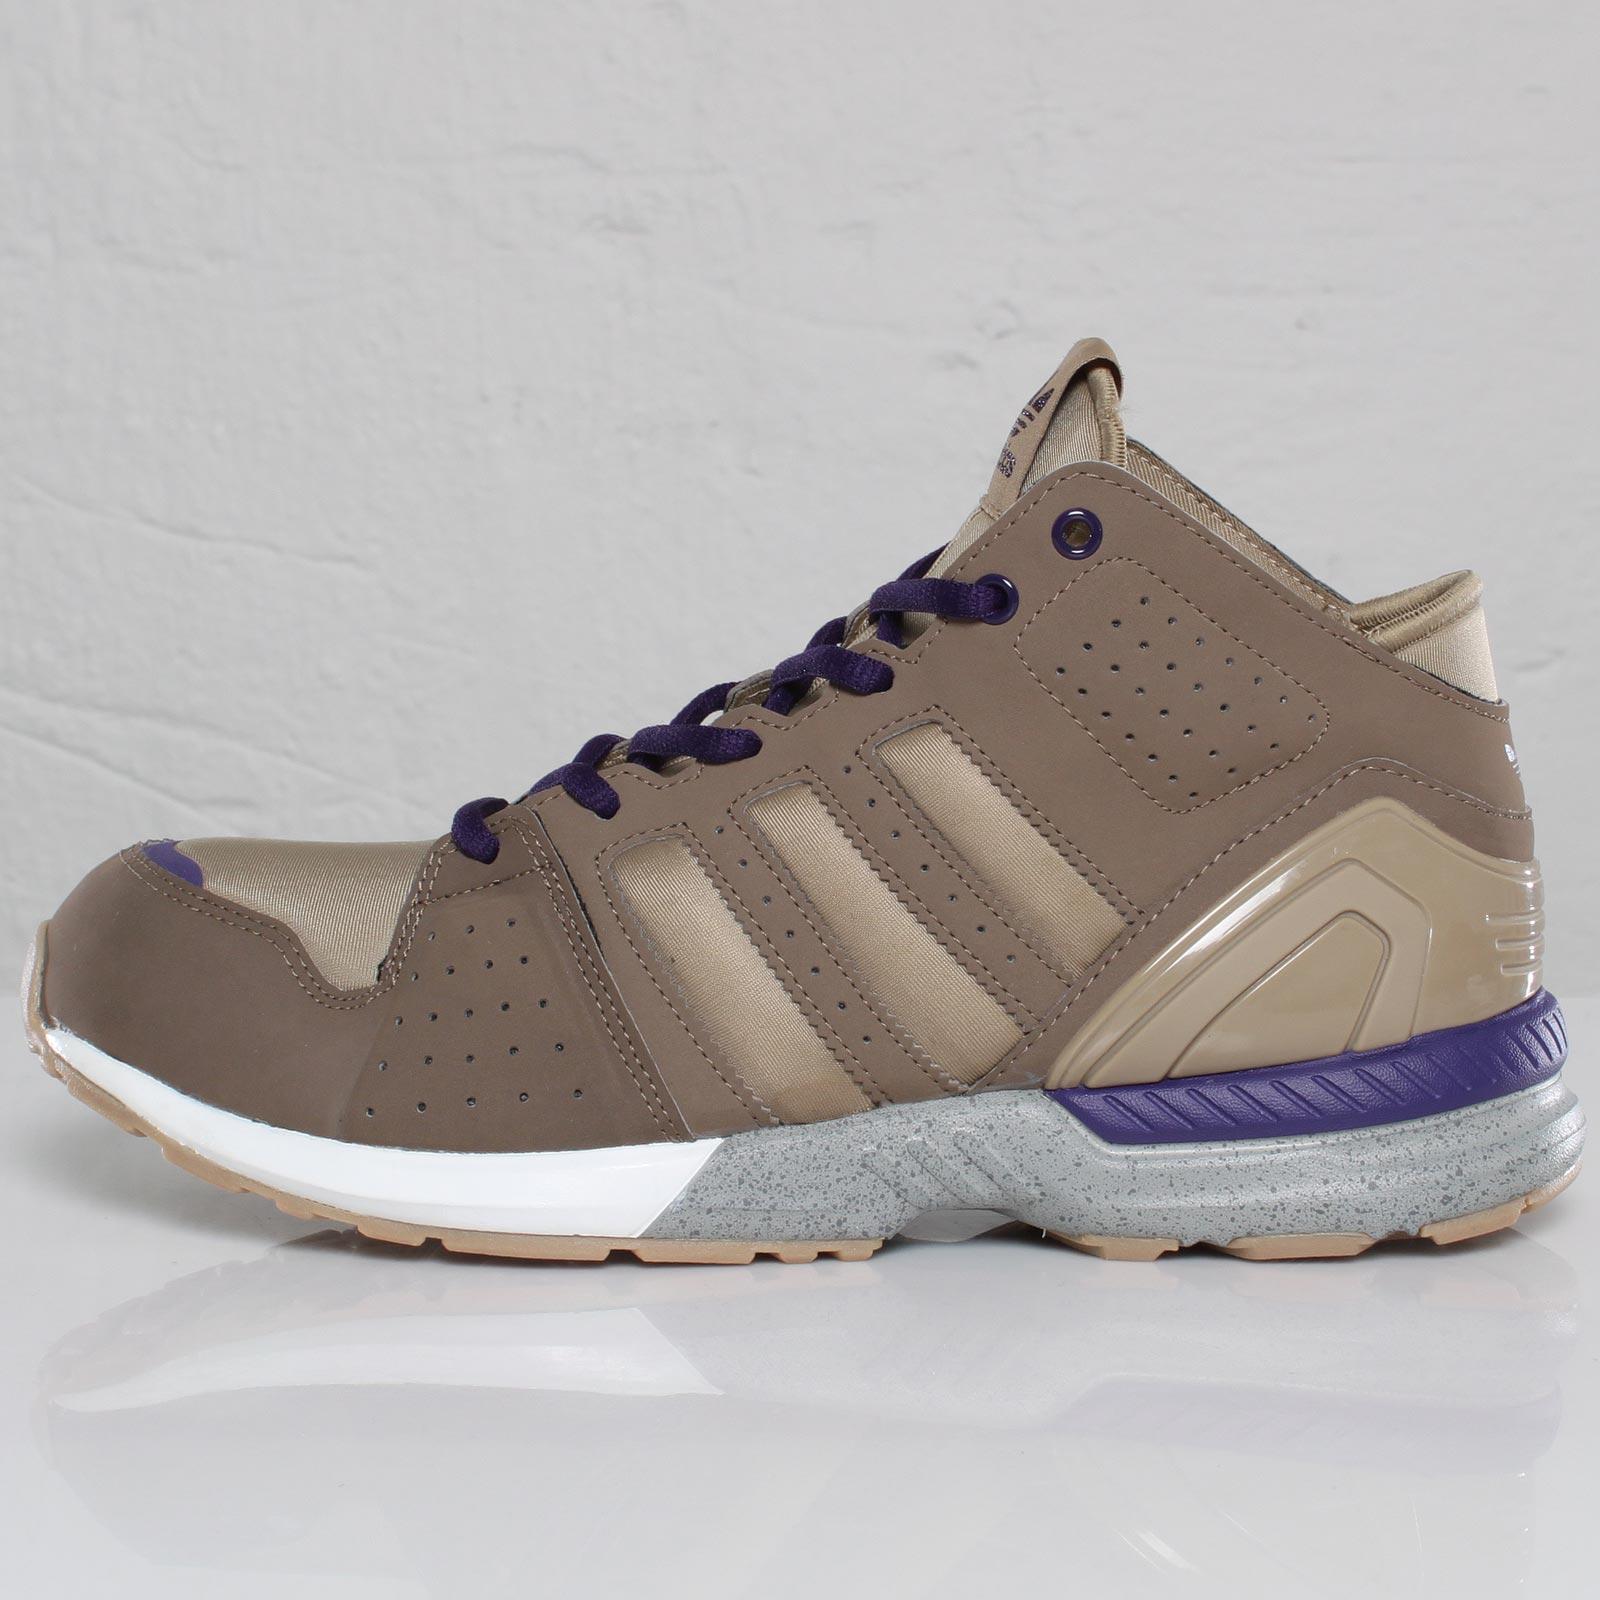 new product 70fb4 1b5fb adidas Torsion NPN Mid - 102704 - Sneakersnstuff | sneakers & streetwear  online since 1999